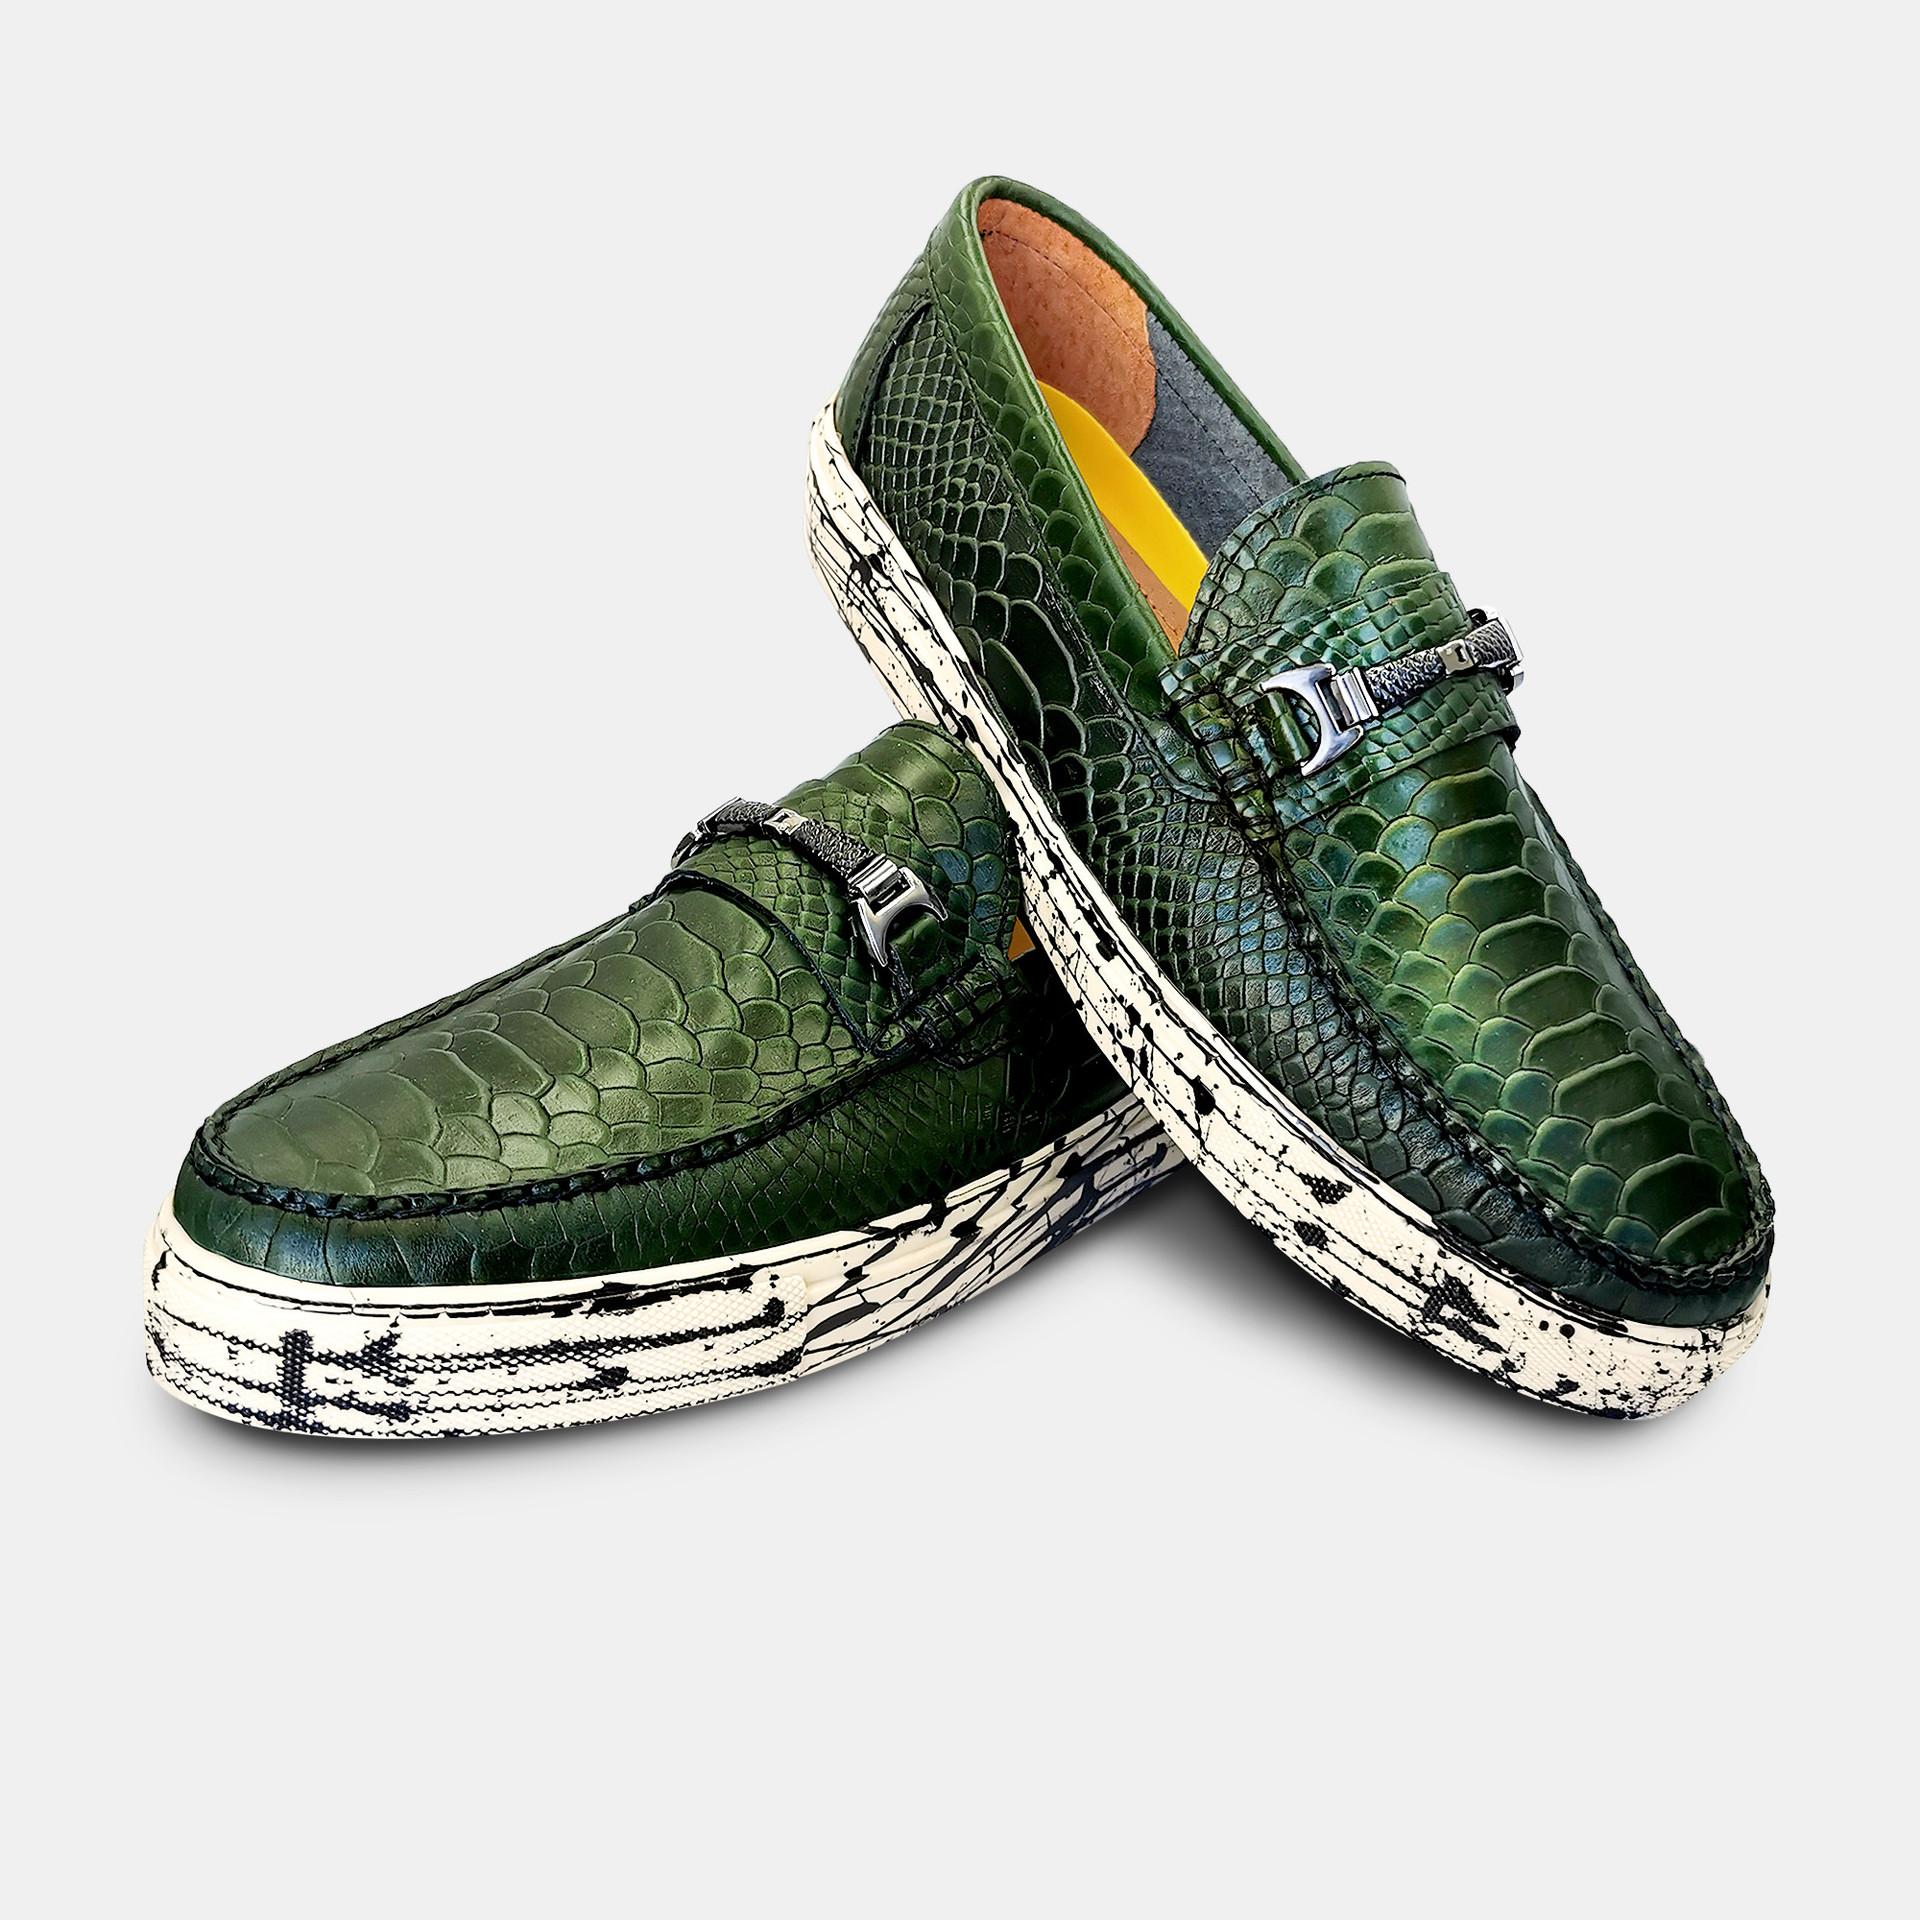 Randem-Sneaker-Spender-Wild-Python-Olive